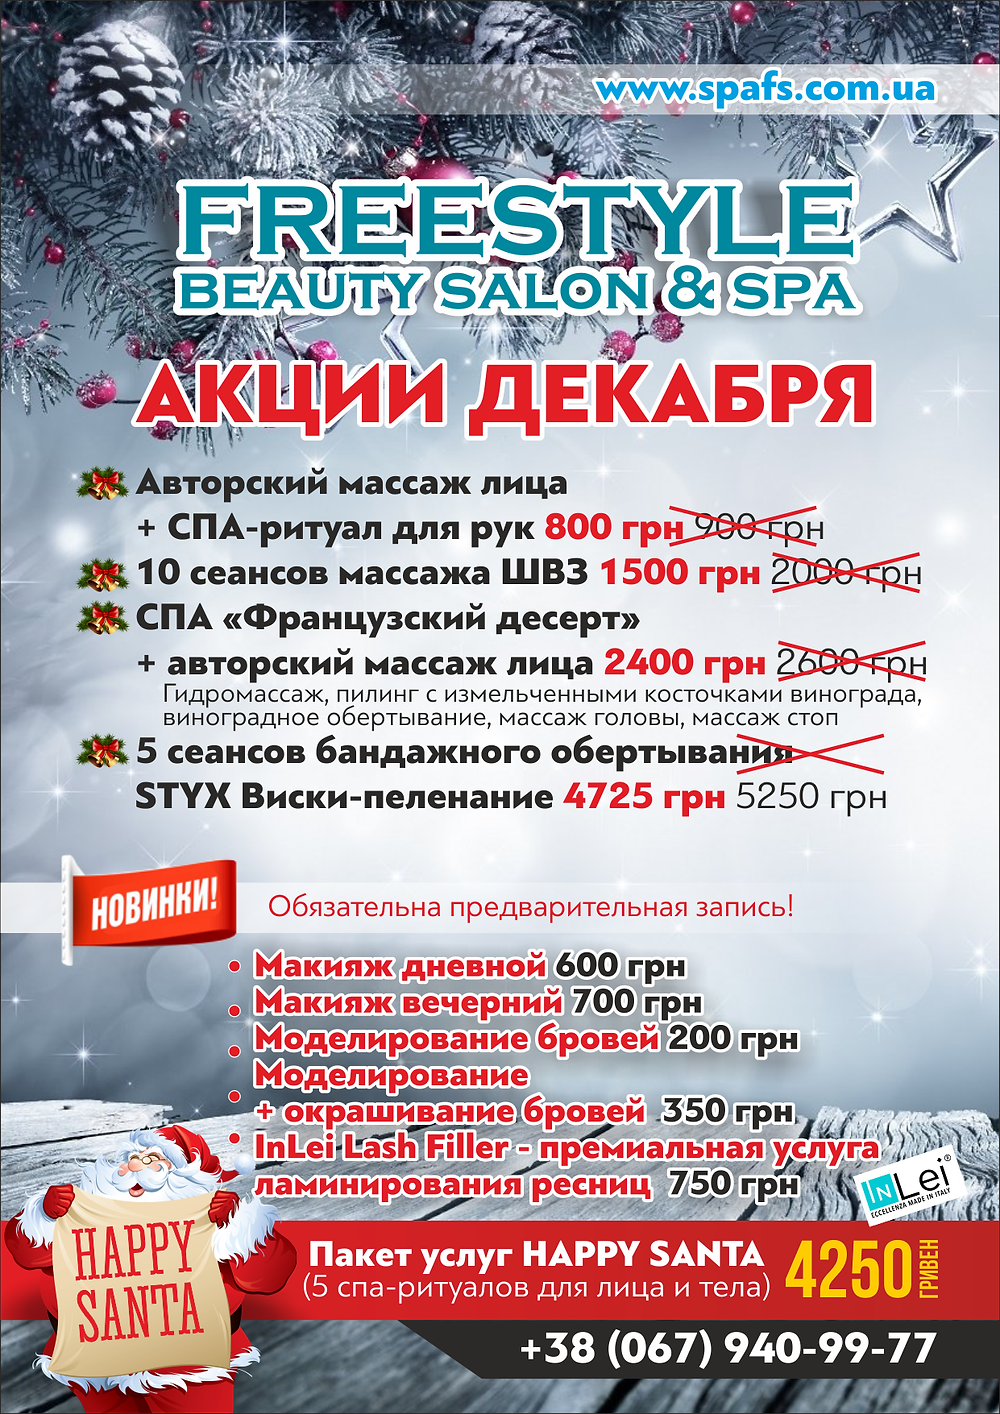 Акции декабря в SPA салоне FREESTYLE!